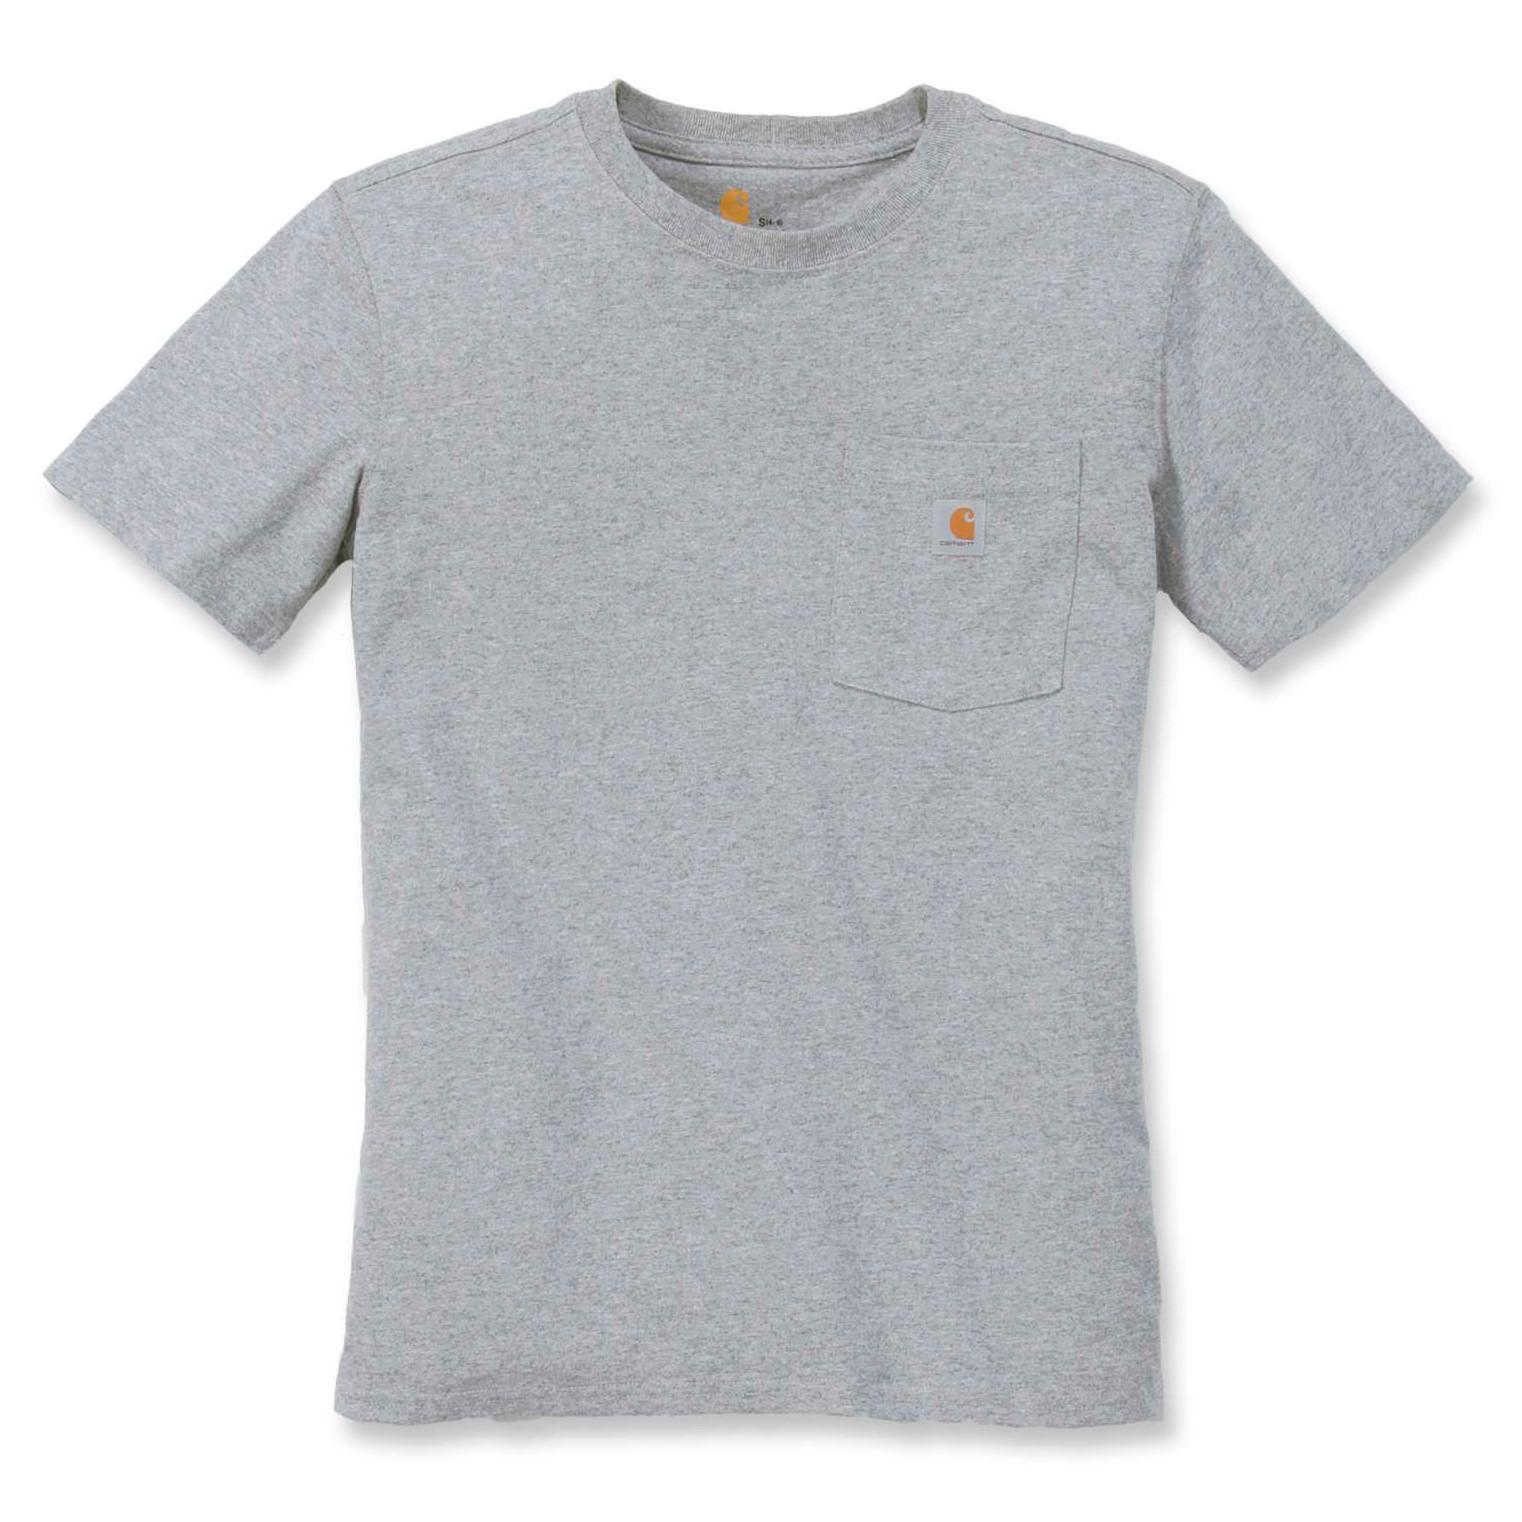 Футболка женская Carhartt WK87 Workwear Pocket T-Shirt - 103067 (Heather Grey, S)